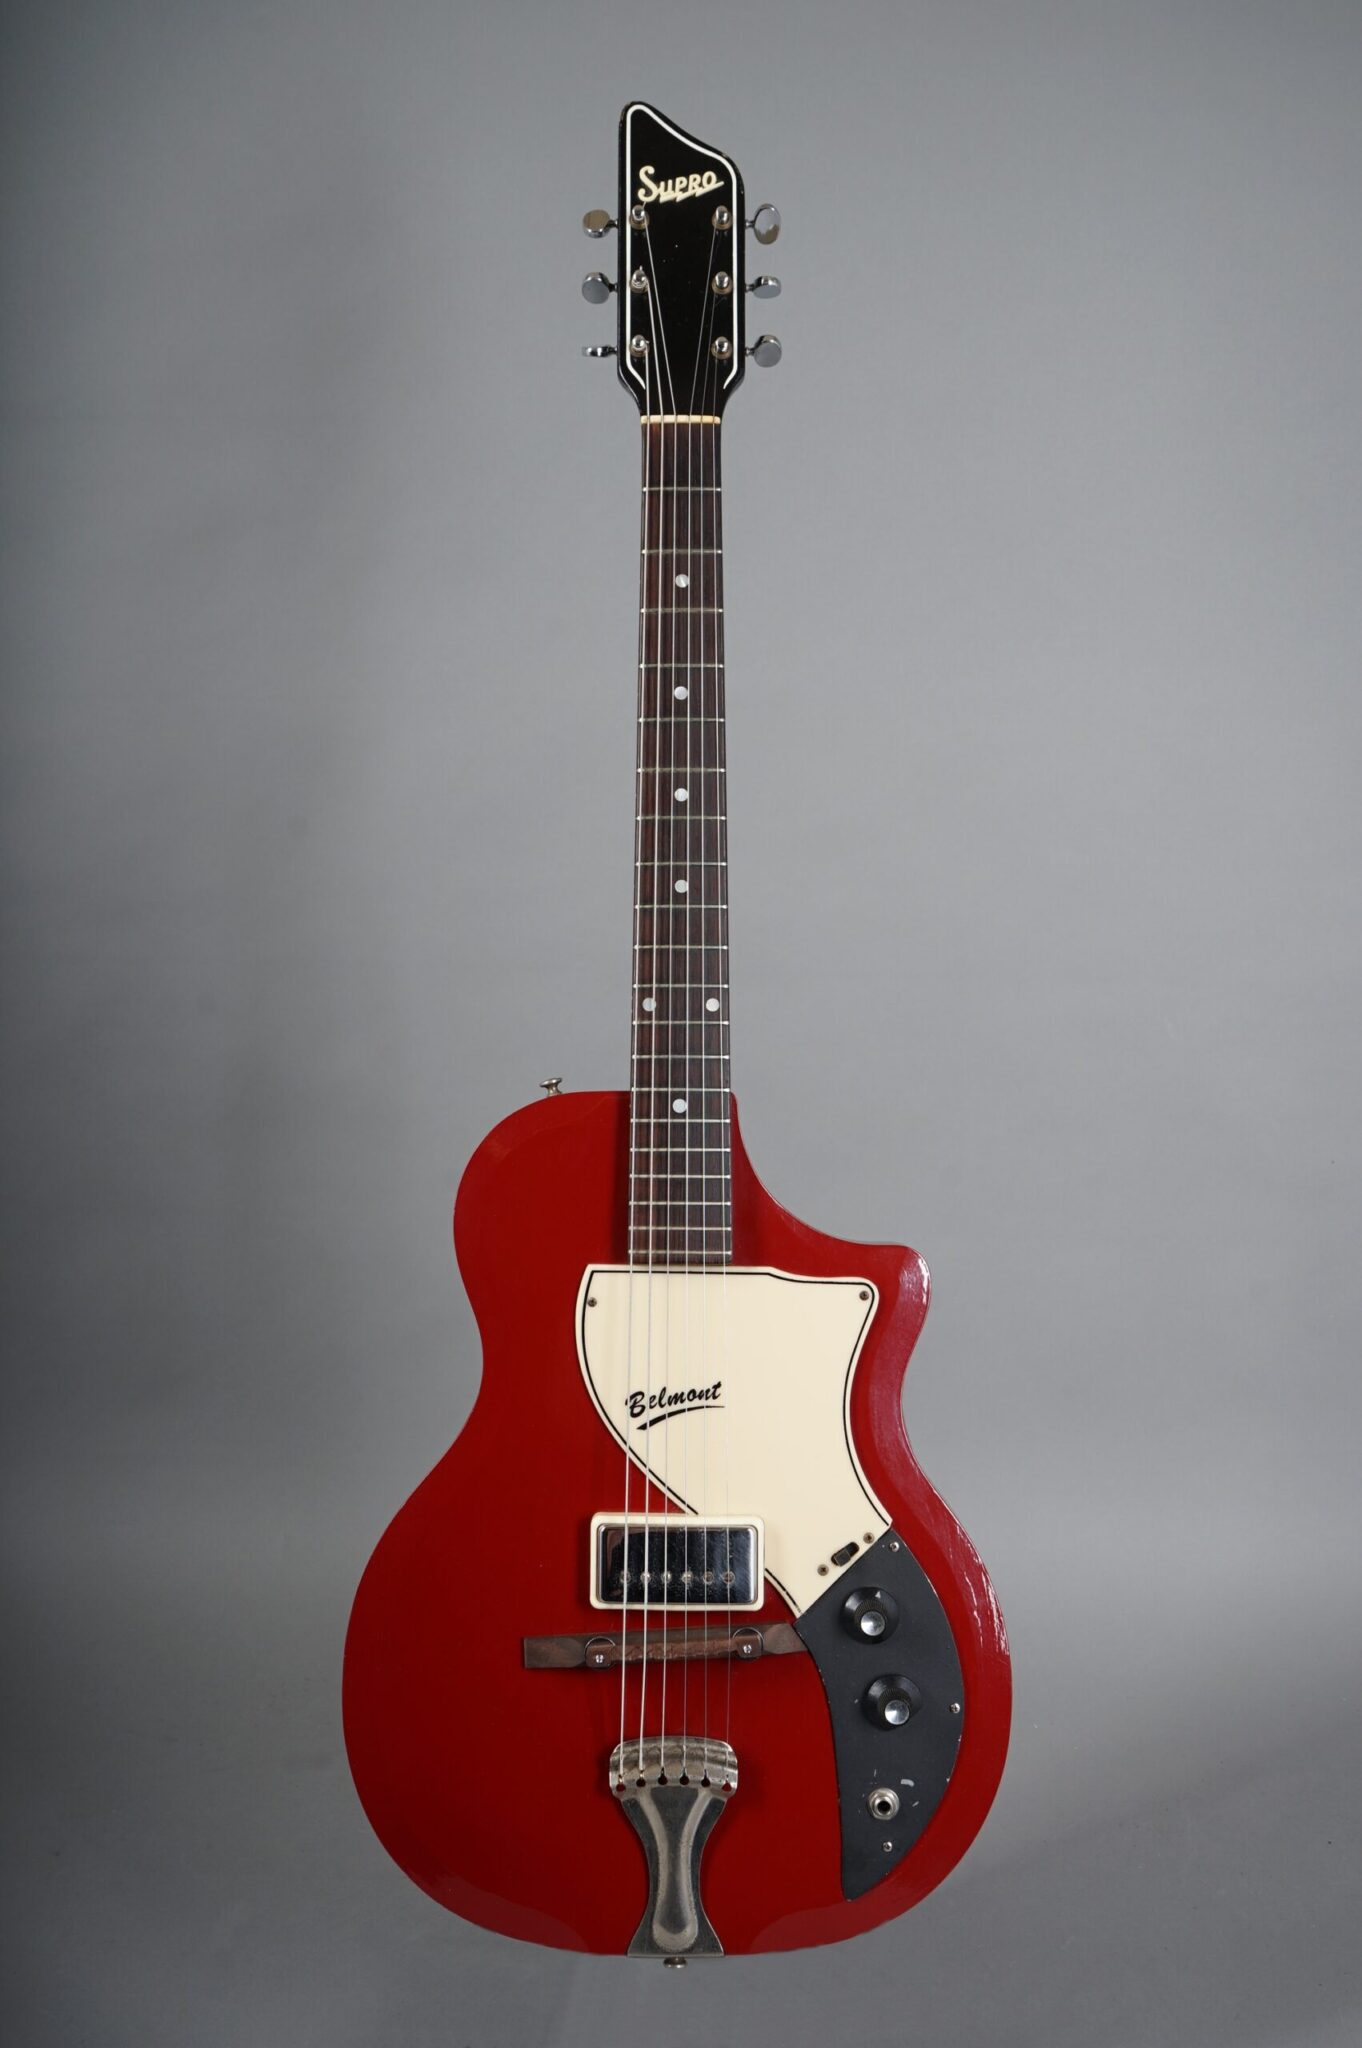 https://guitarpoint.de/app/uploads/products/1960-supro-1570-belmont-maroon/1960-Supro-Belmond-Maroon-T46678-1-scaled-1362x2048.jpg